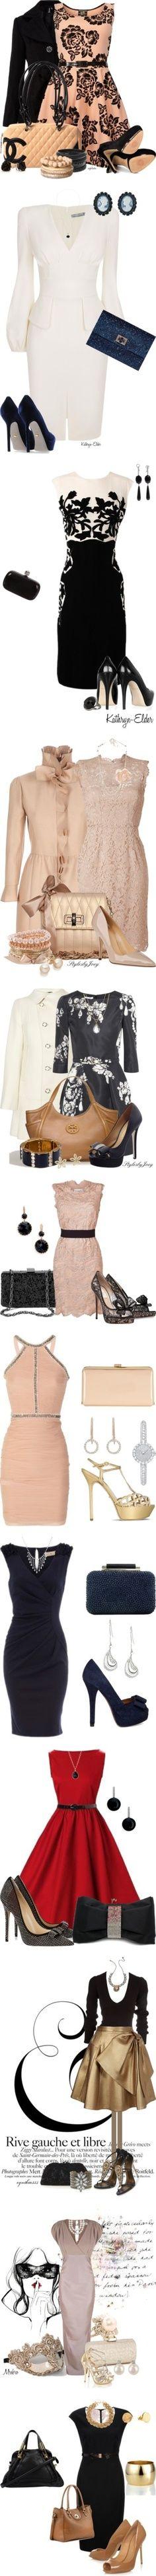 classy A line dresses